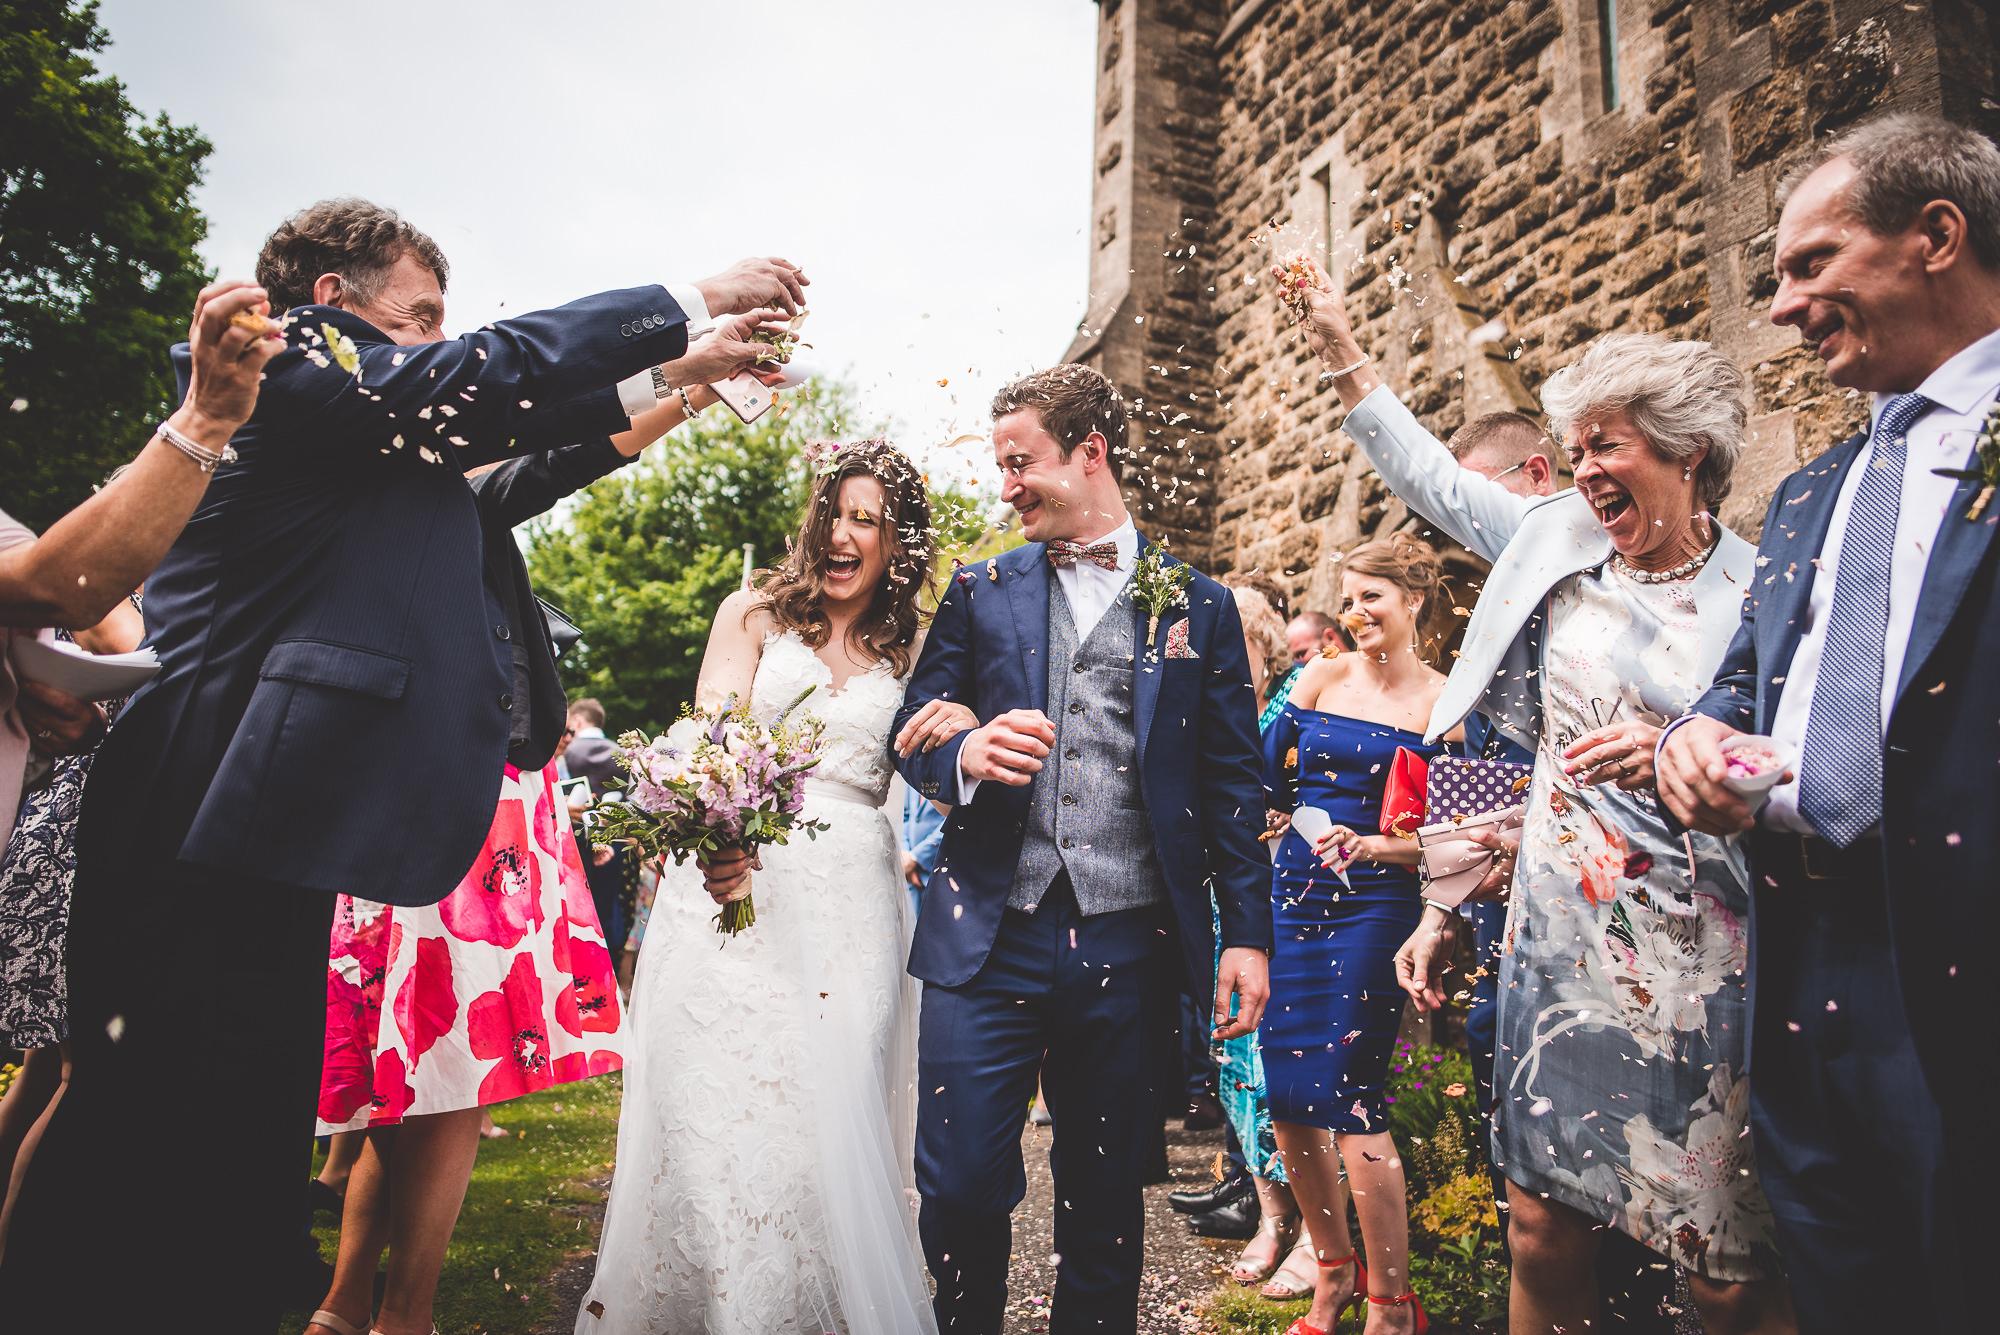 Veils & Bales Wedding Photography | Charlie & Steve SCSS 088